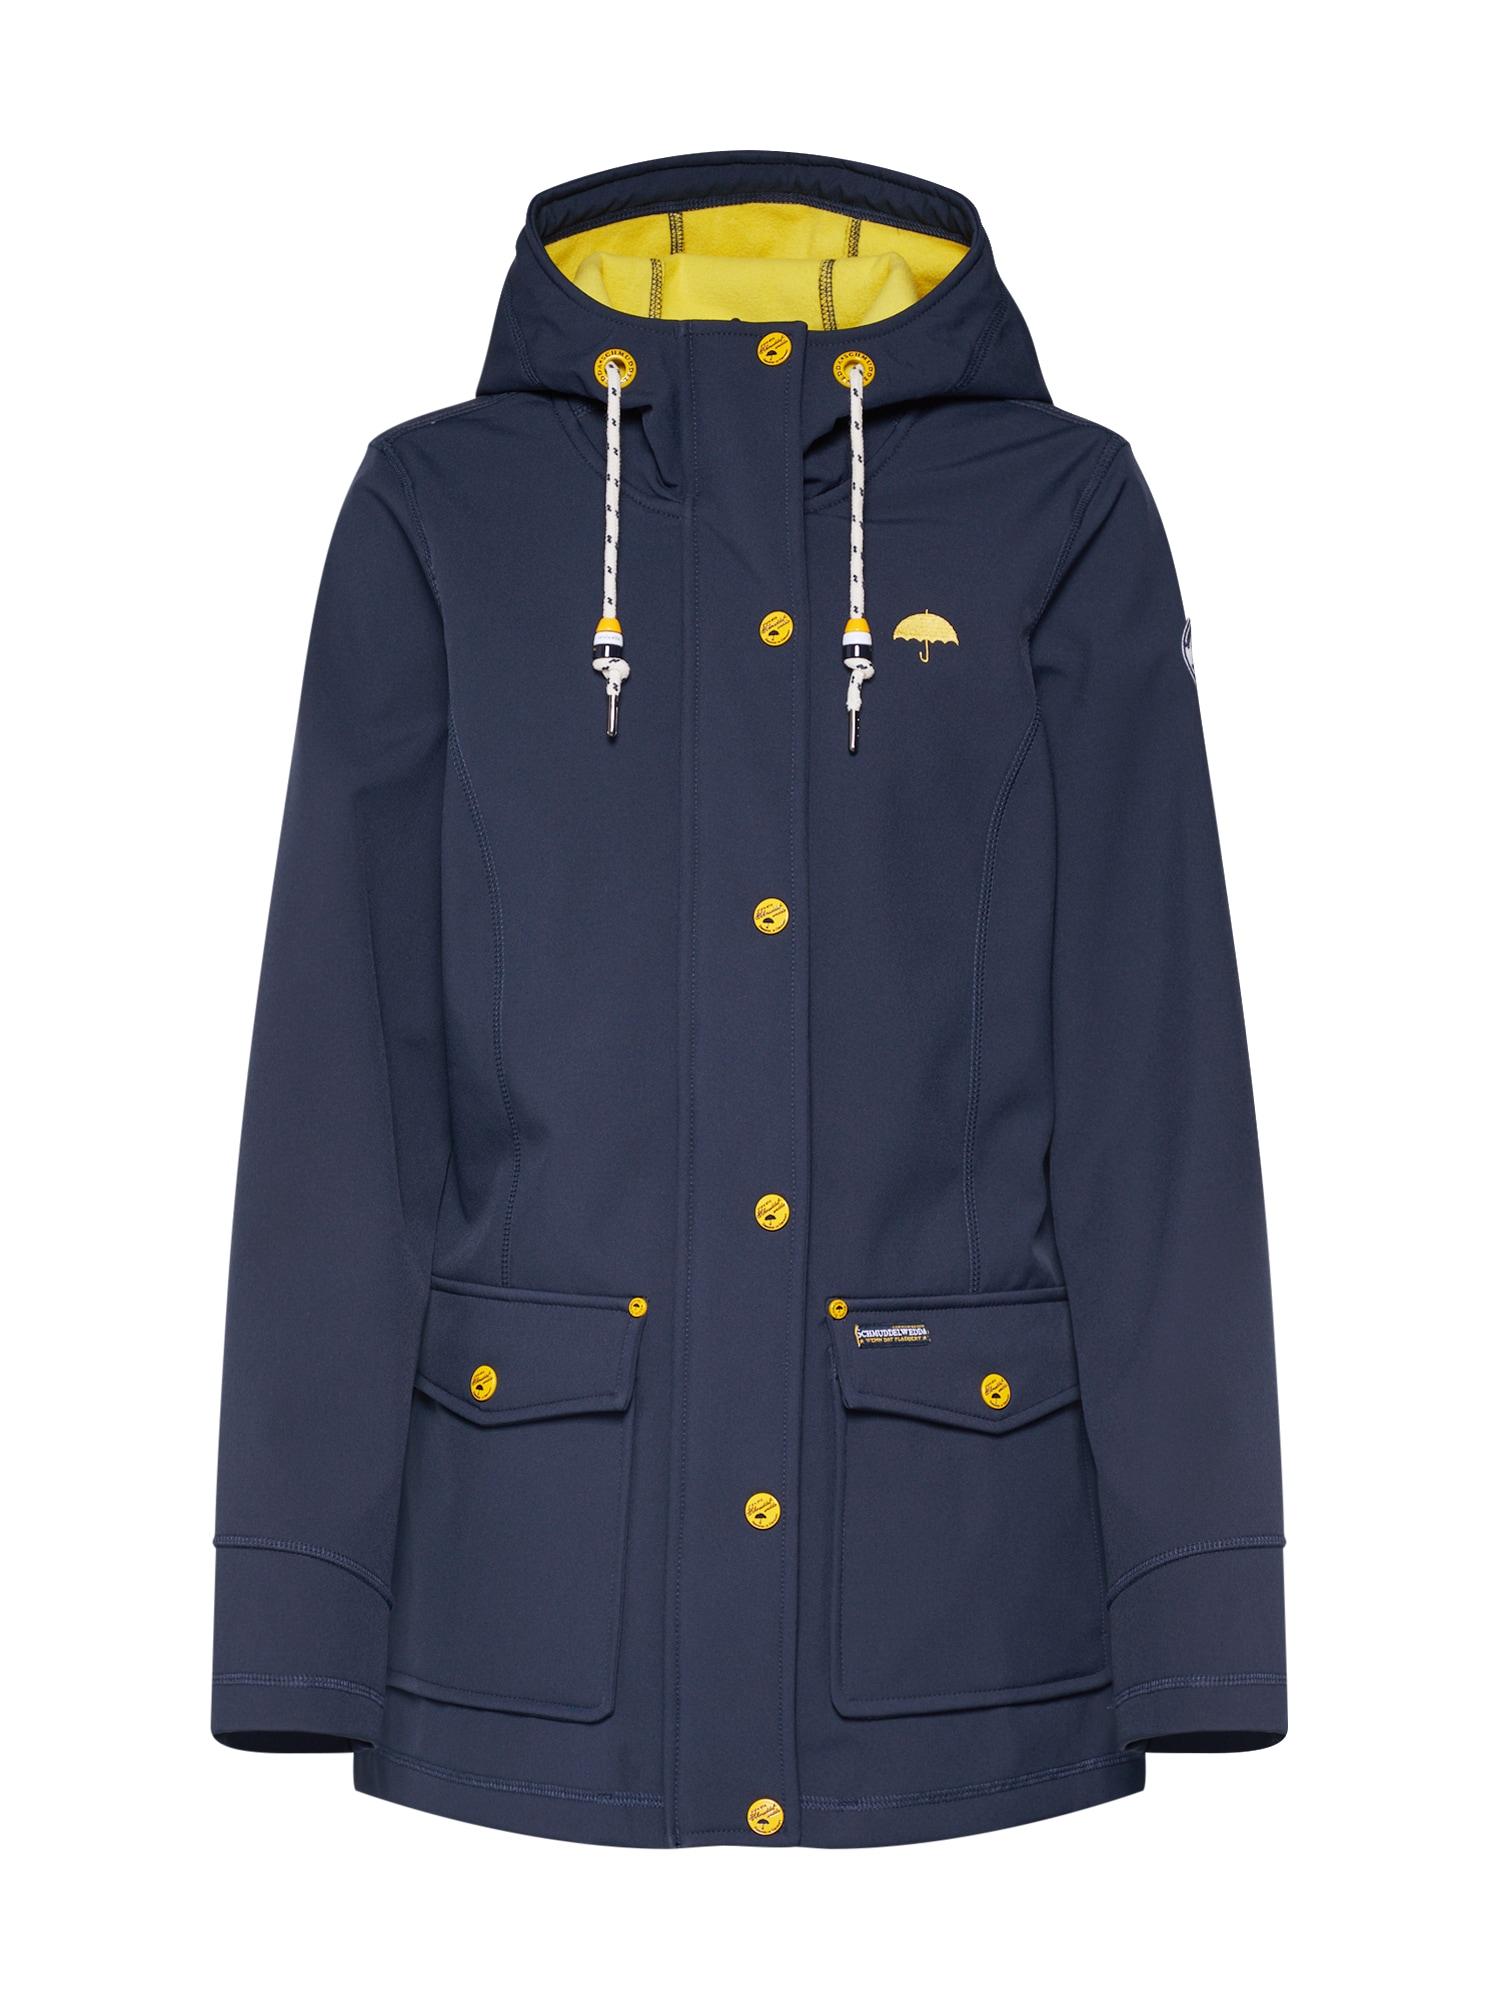 Přechodná bunda Softshell   marine modrá žlutá Schmuddelwedda